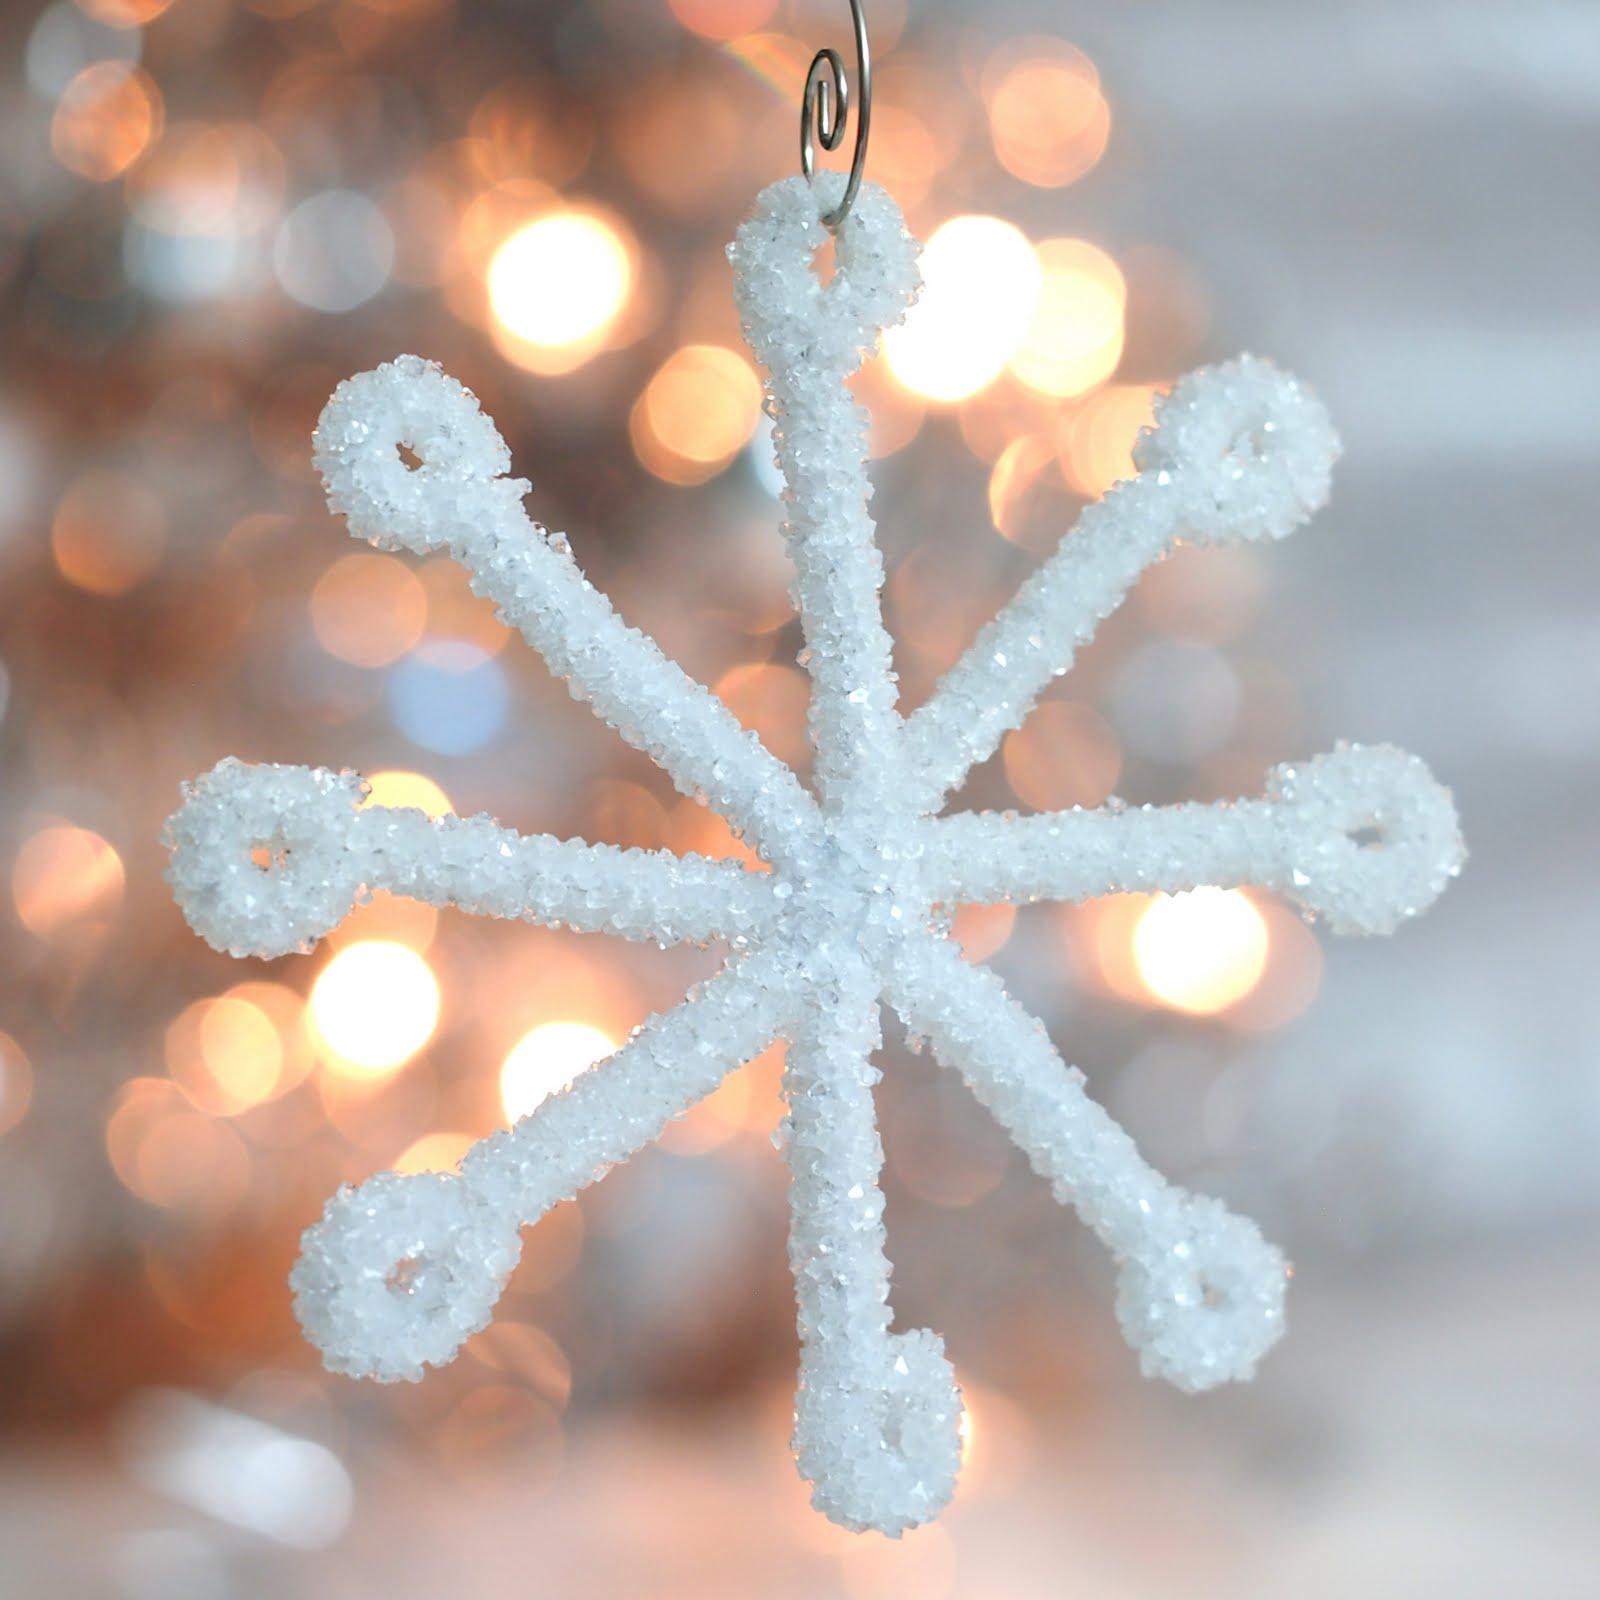 The Tiny Funnel: Borax Christmas Ornaments